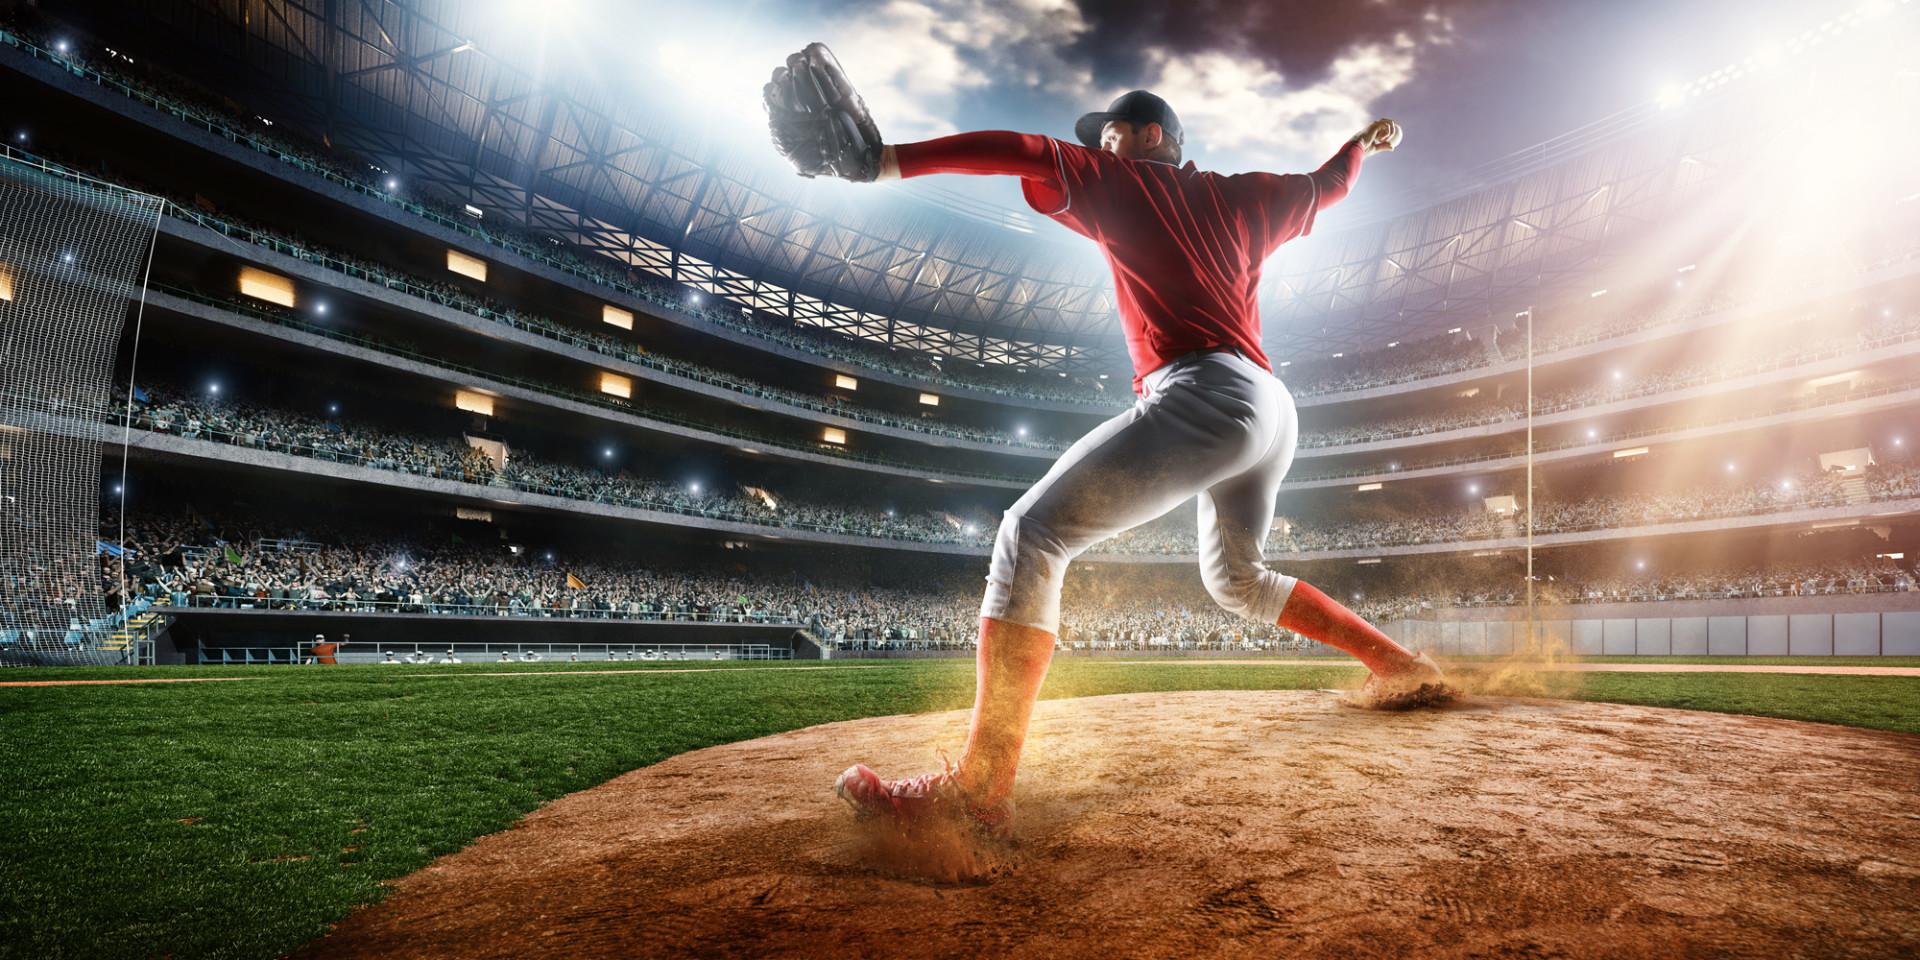 23_03_2016_baseball_game_16_2-1920x960